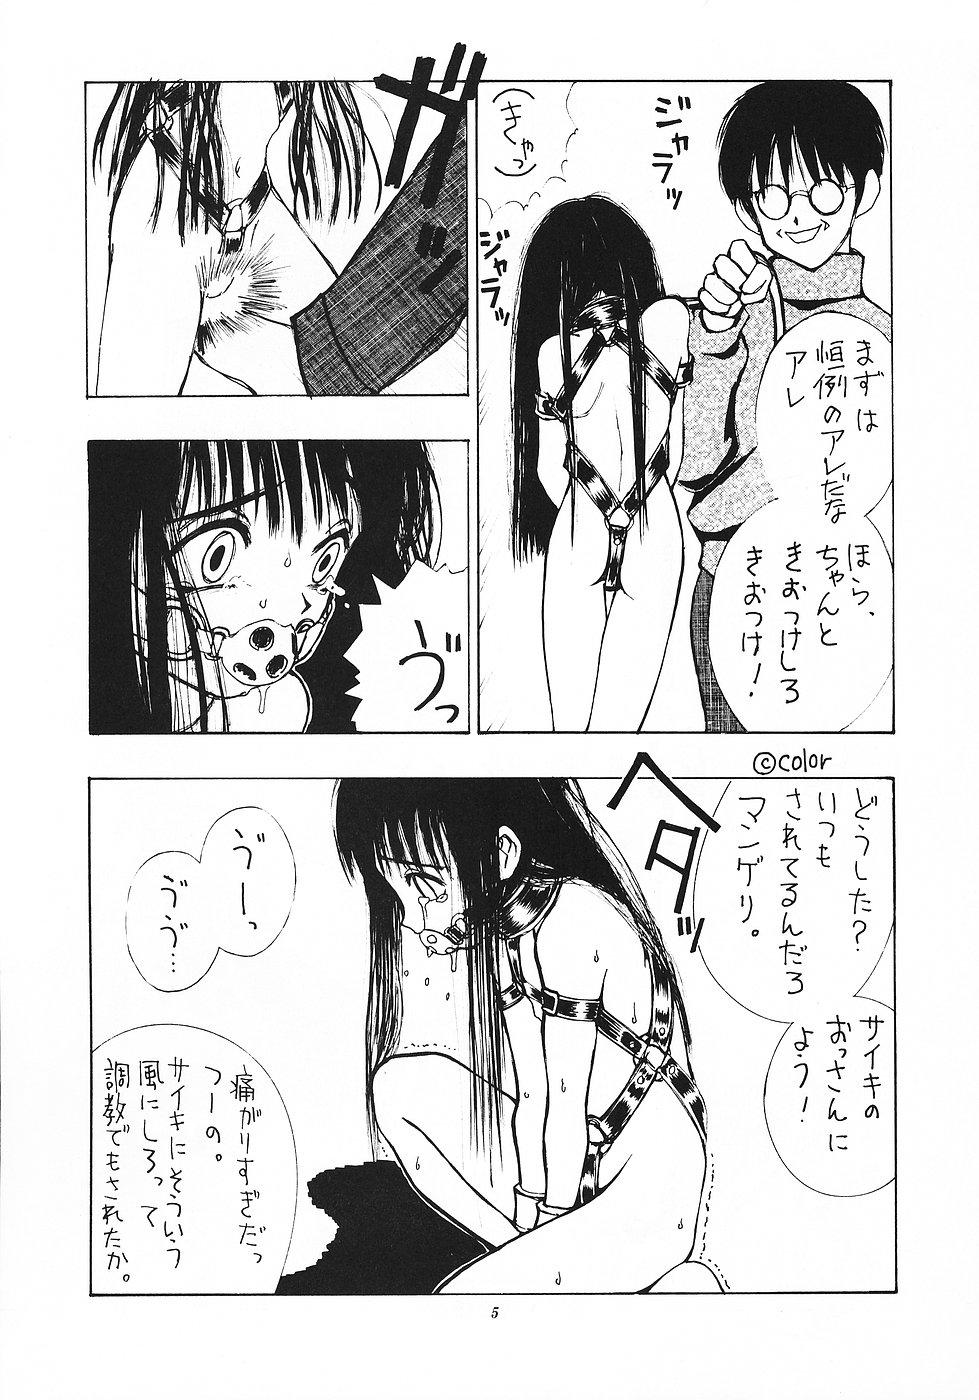 Shikisaiengi 3 3